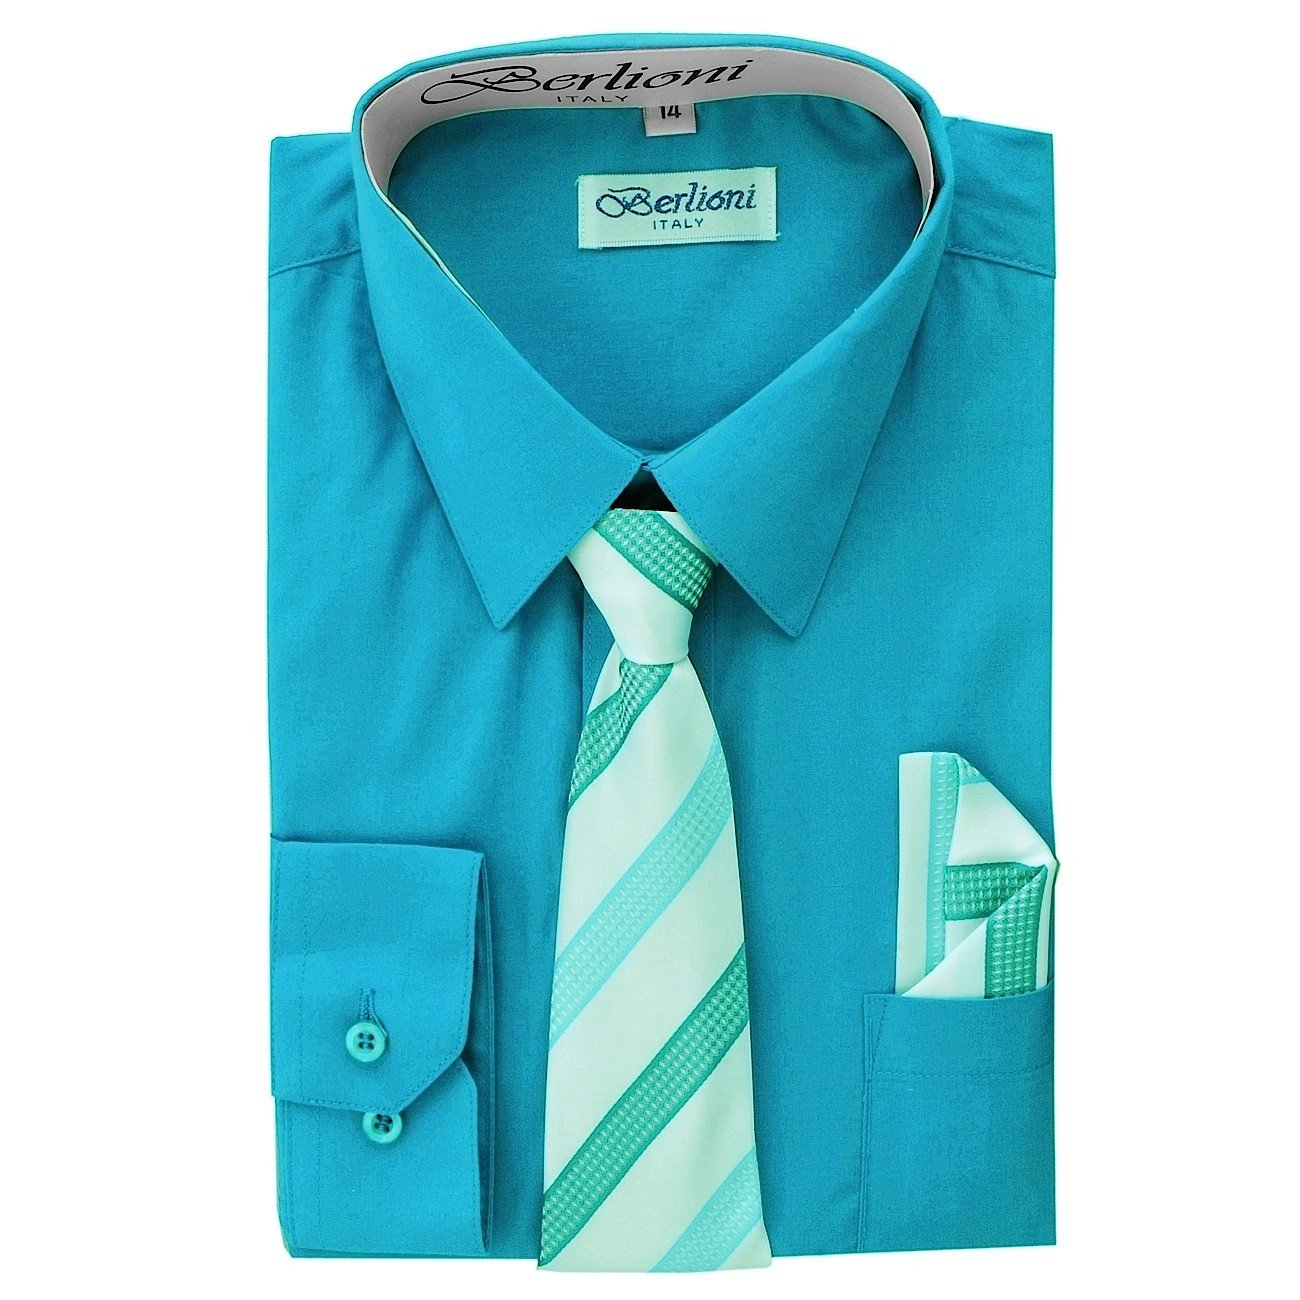 Elegant Boys Button Down Turquoise (707) Dress Shirt/Necktie/Hanky (16)